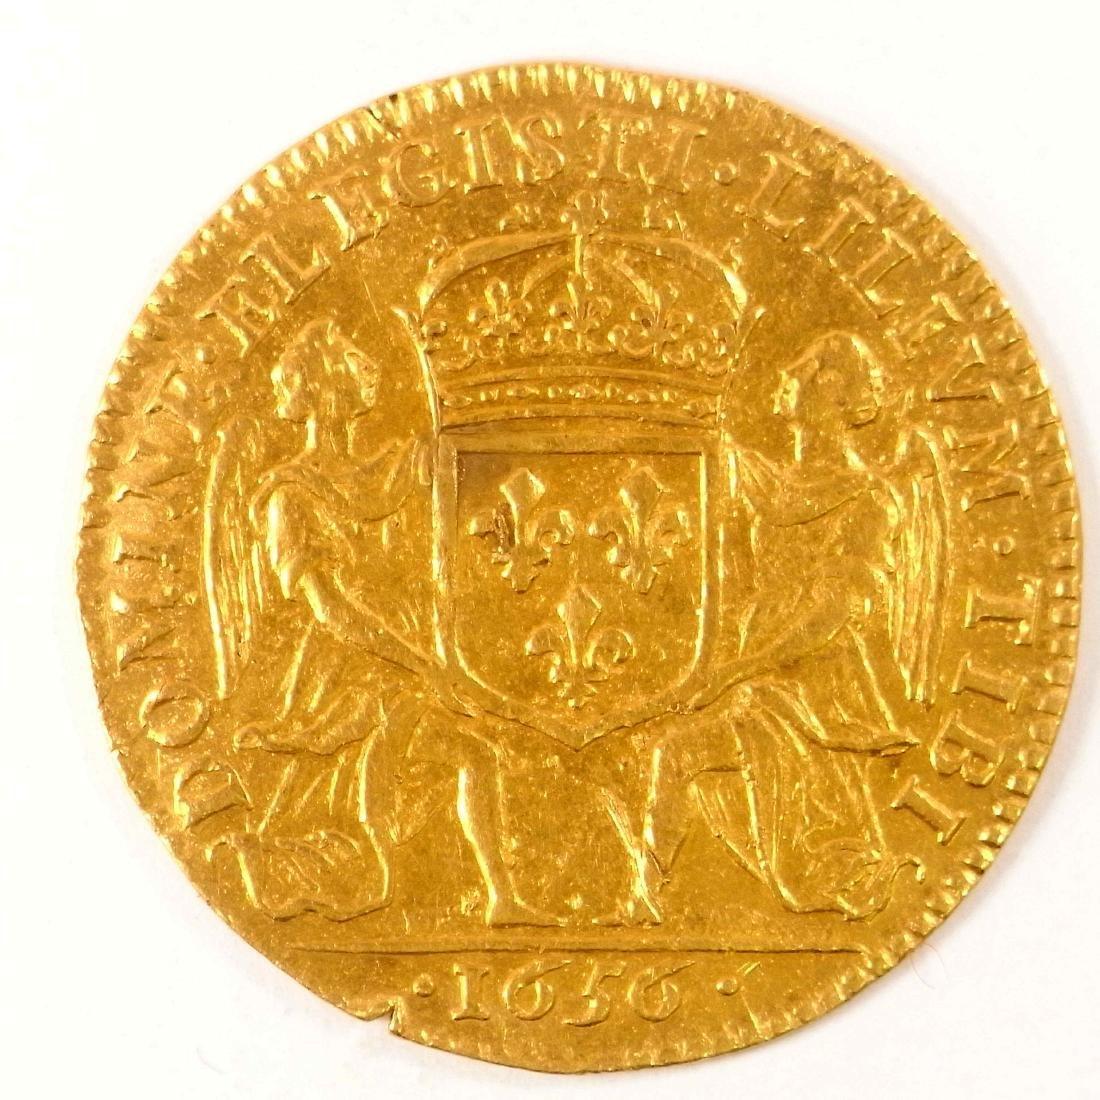 Lis d'Or France Royal